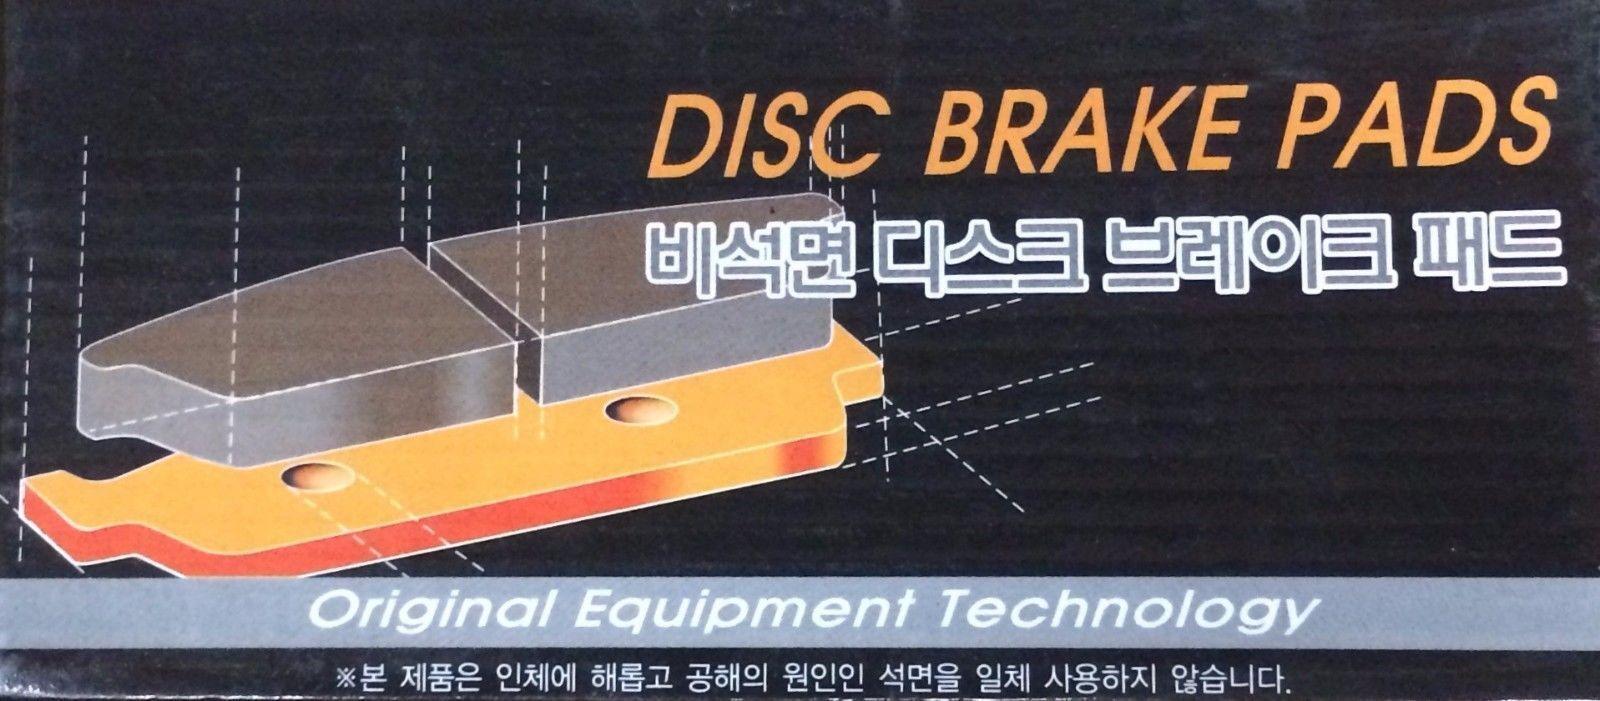 2004 Subaru Outback Sedan Black Loop Driver /& Passenger Floor 2003 2001 2002 GGBAILEY D2995B-F1A-BK-LP Custom Fit Car Mats for 2000